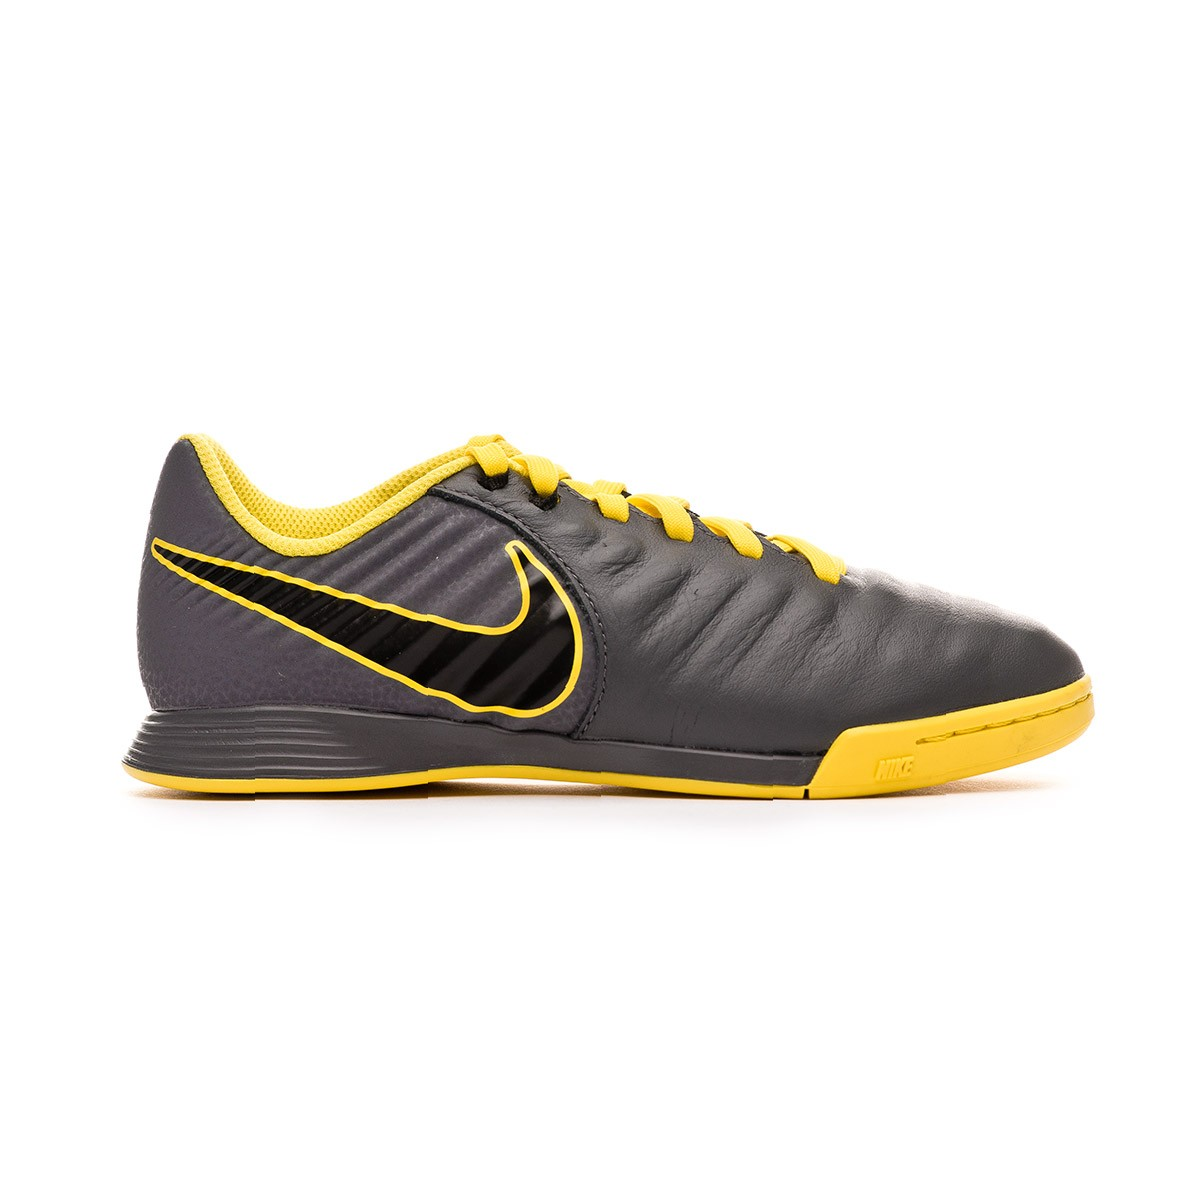 a361d3ebbd9 Futsal Boot Nike Tiempo LegendX VII Academy IC Niño Dark grey-Black-Optical  yellow - Football store Fútbol Emotion